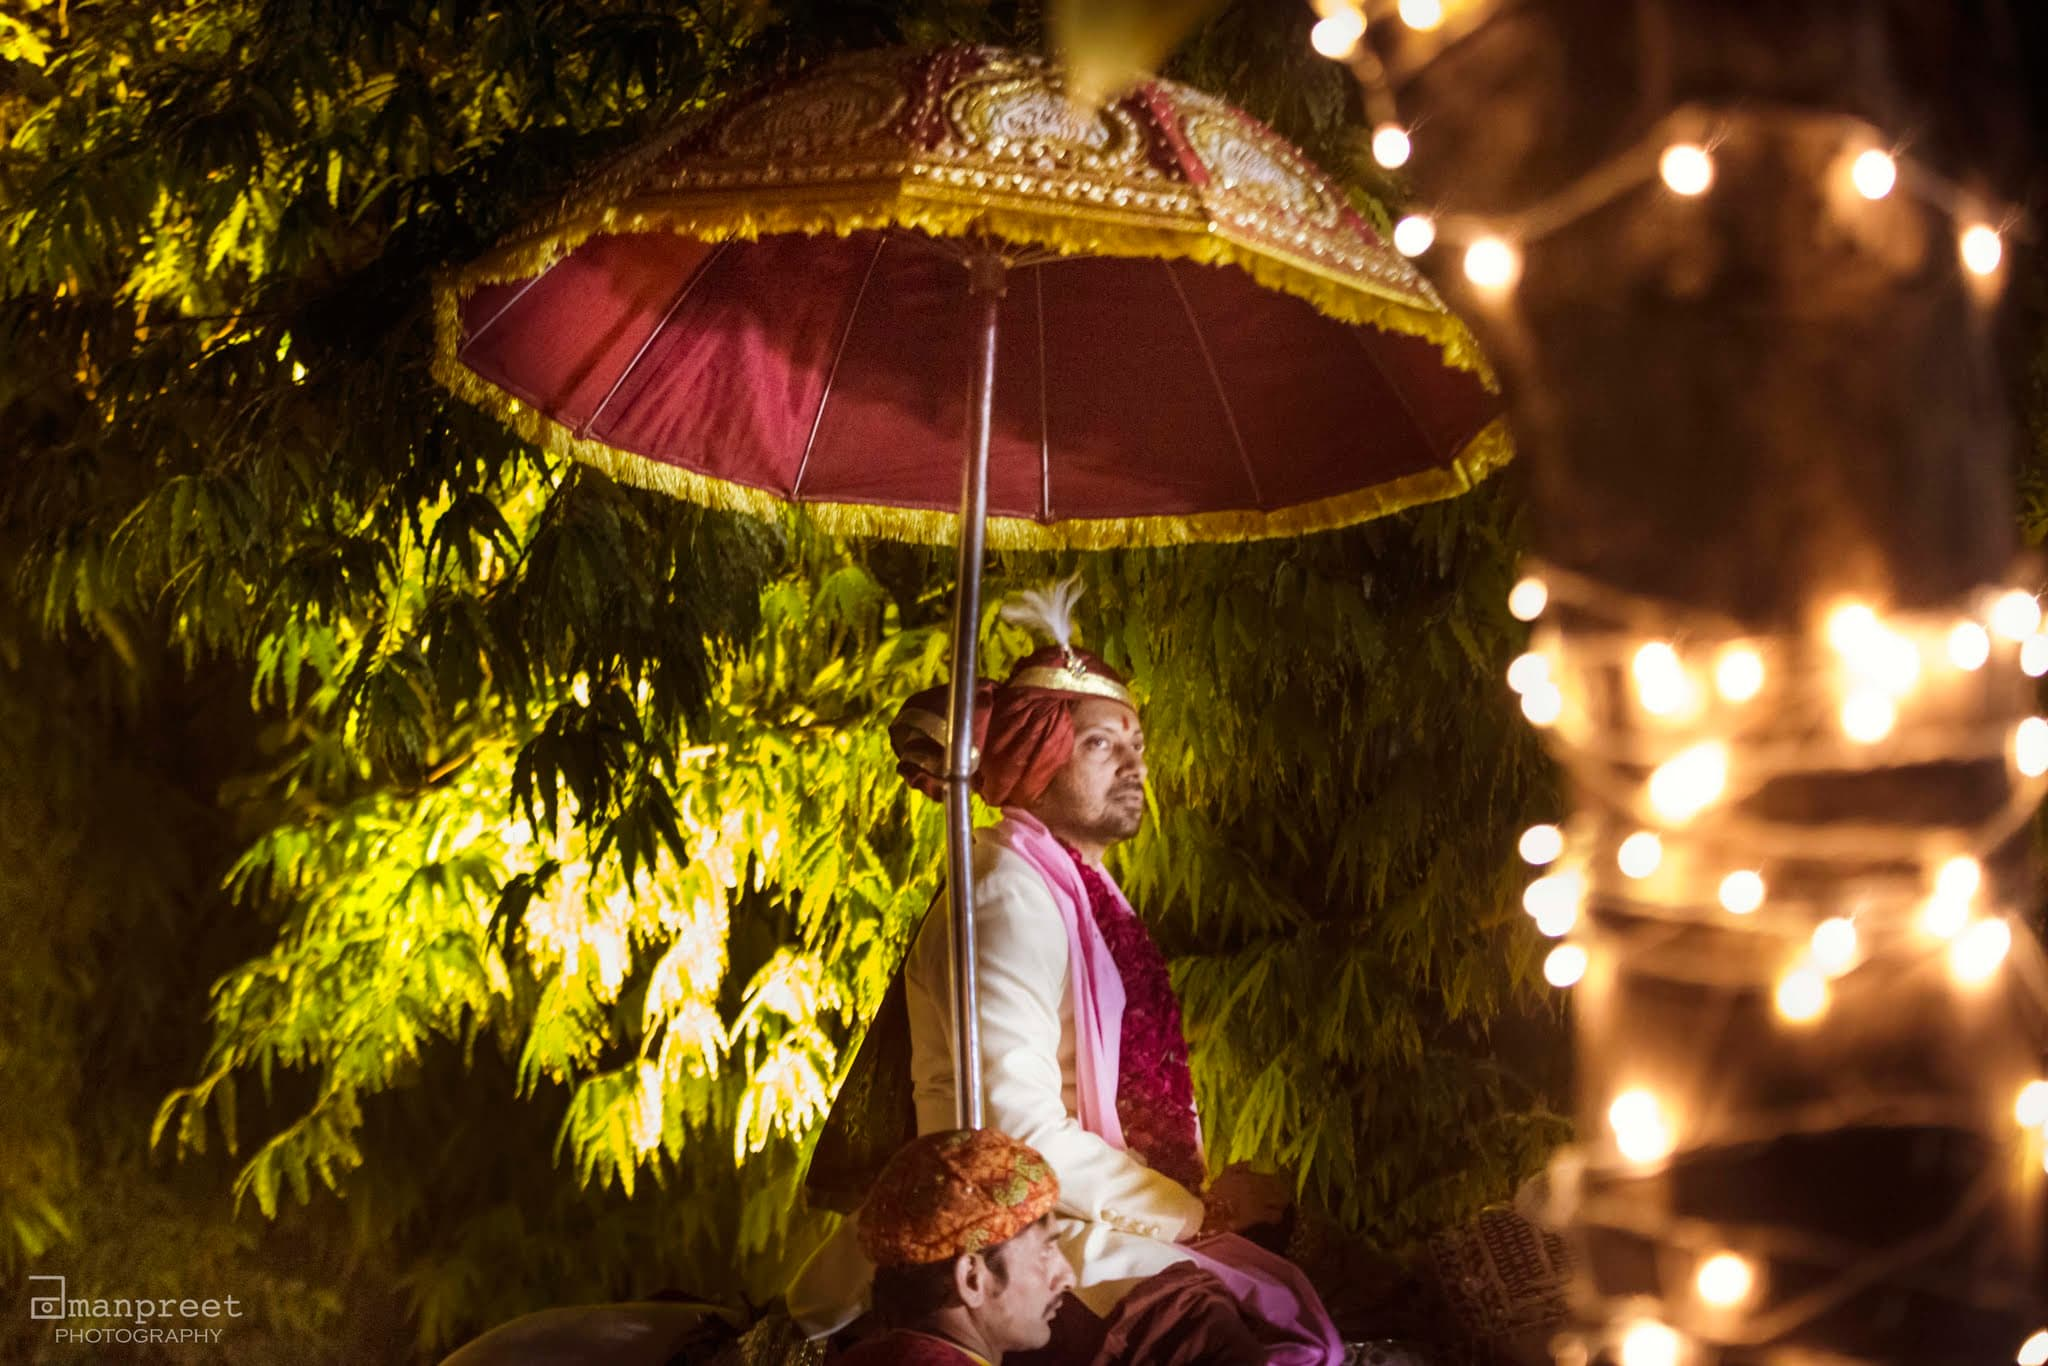 the groom!:the umrao, mandira wirk, amanpreet photography, zorba